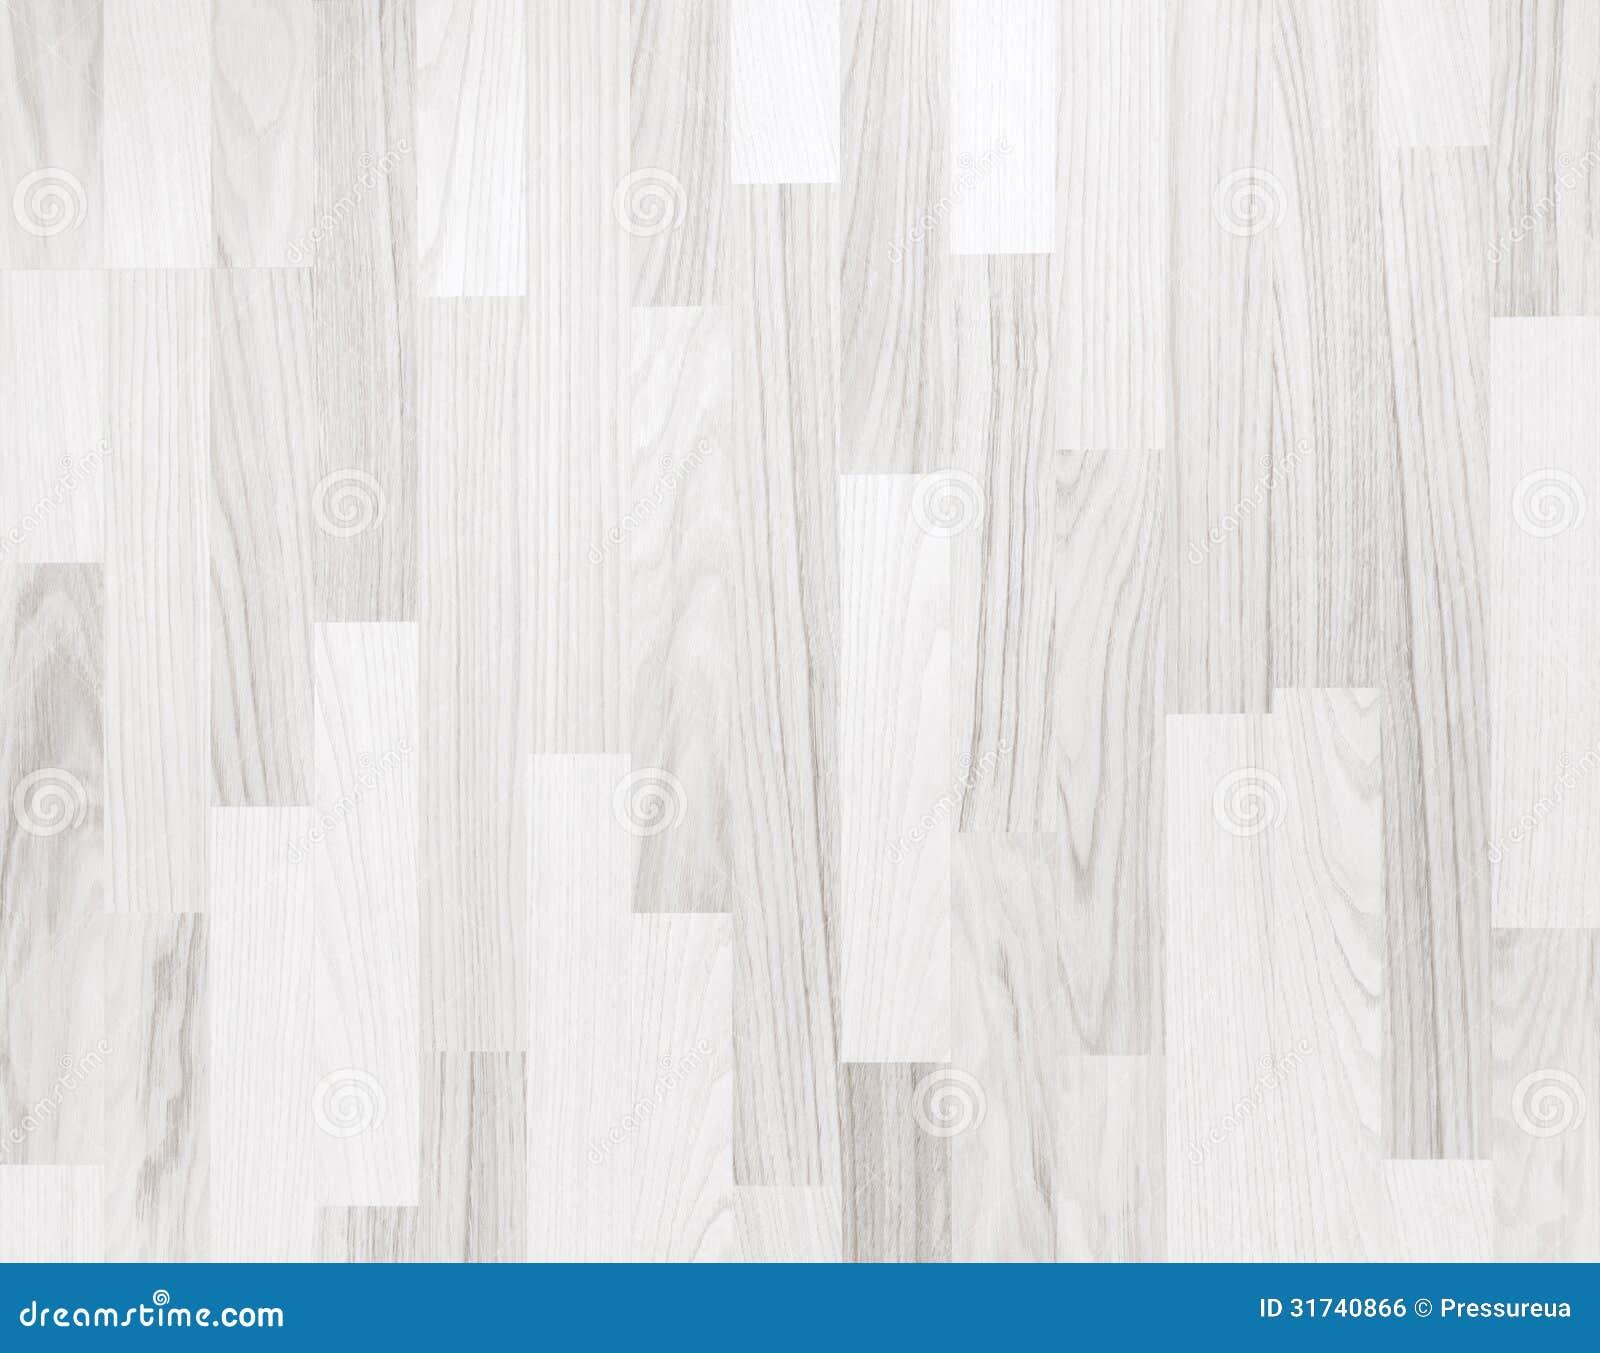 White Wooden Parquet Flooring Texture Horizontal Seamless Wooden